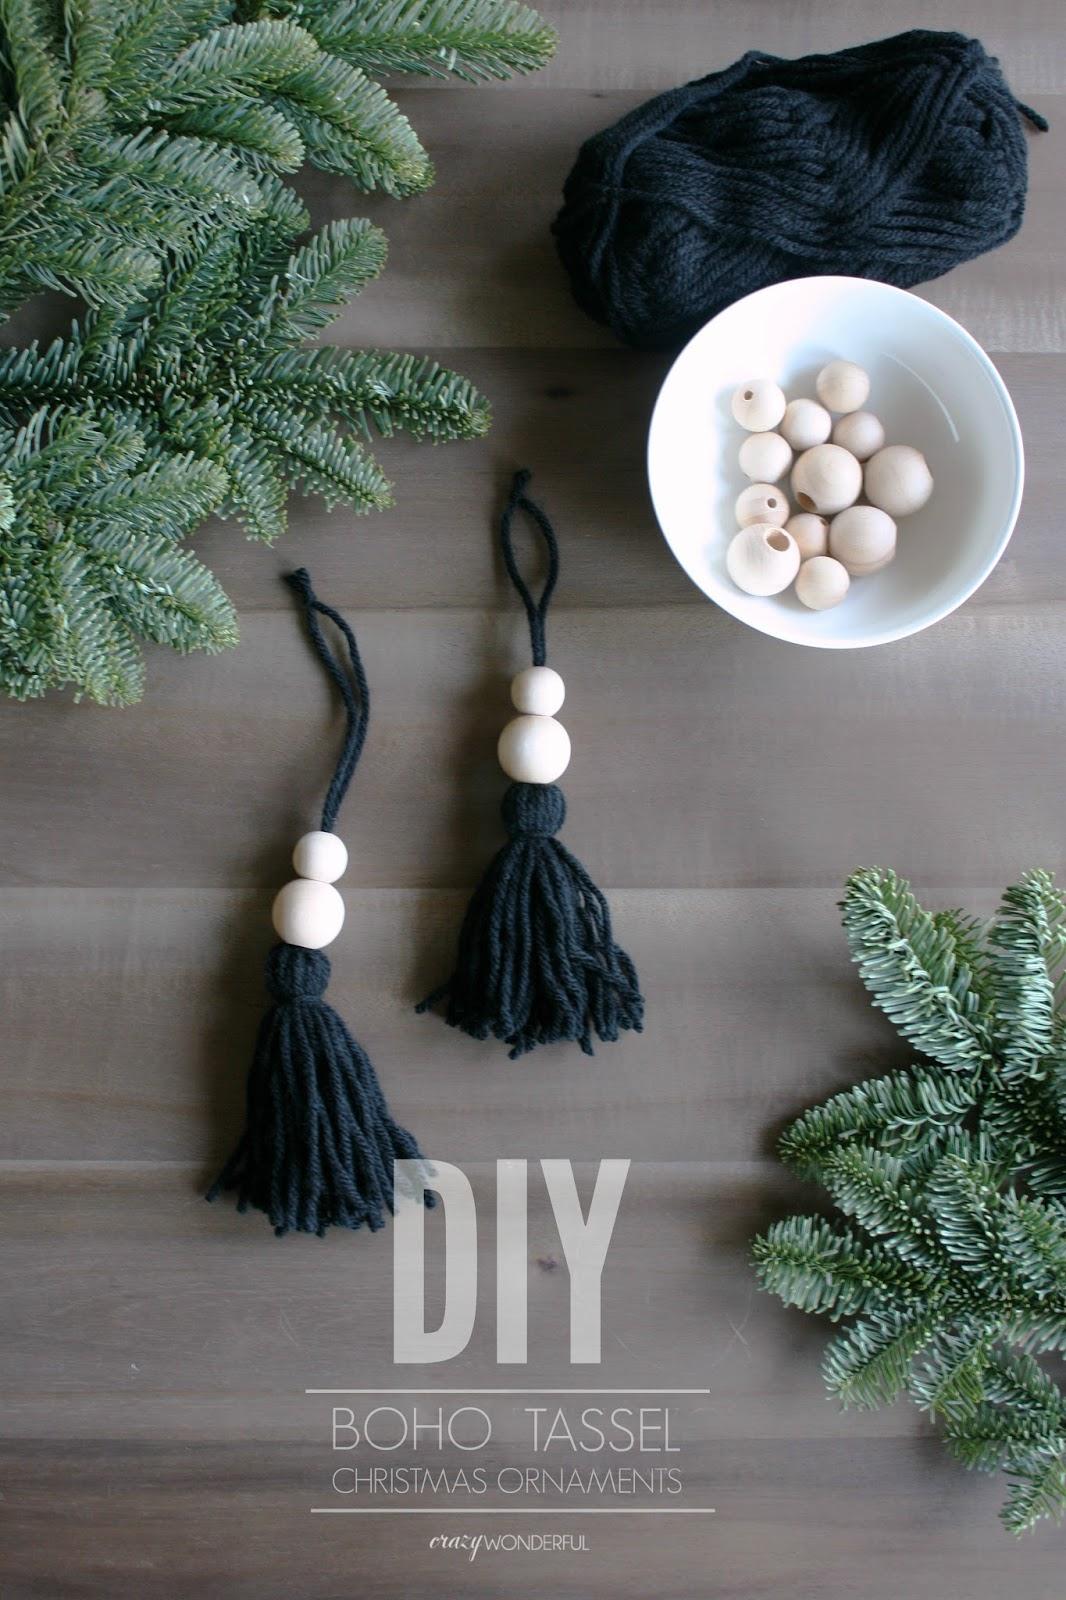 Diy Boho Christmas Ornaments Crazy Wonderful